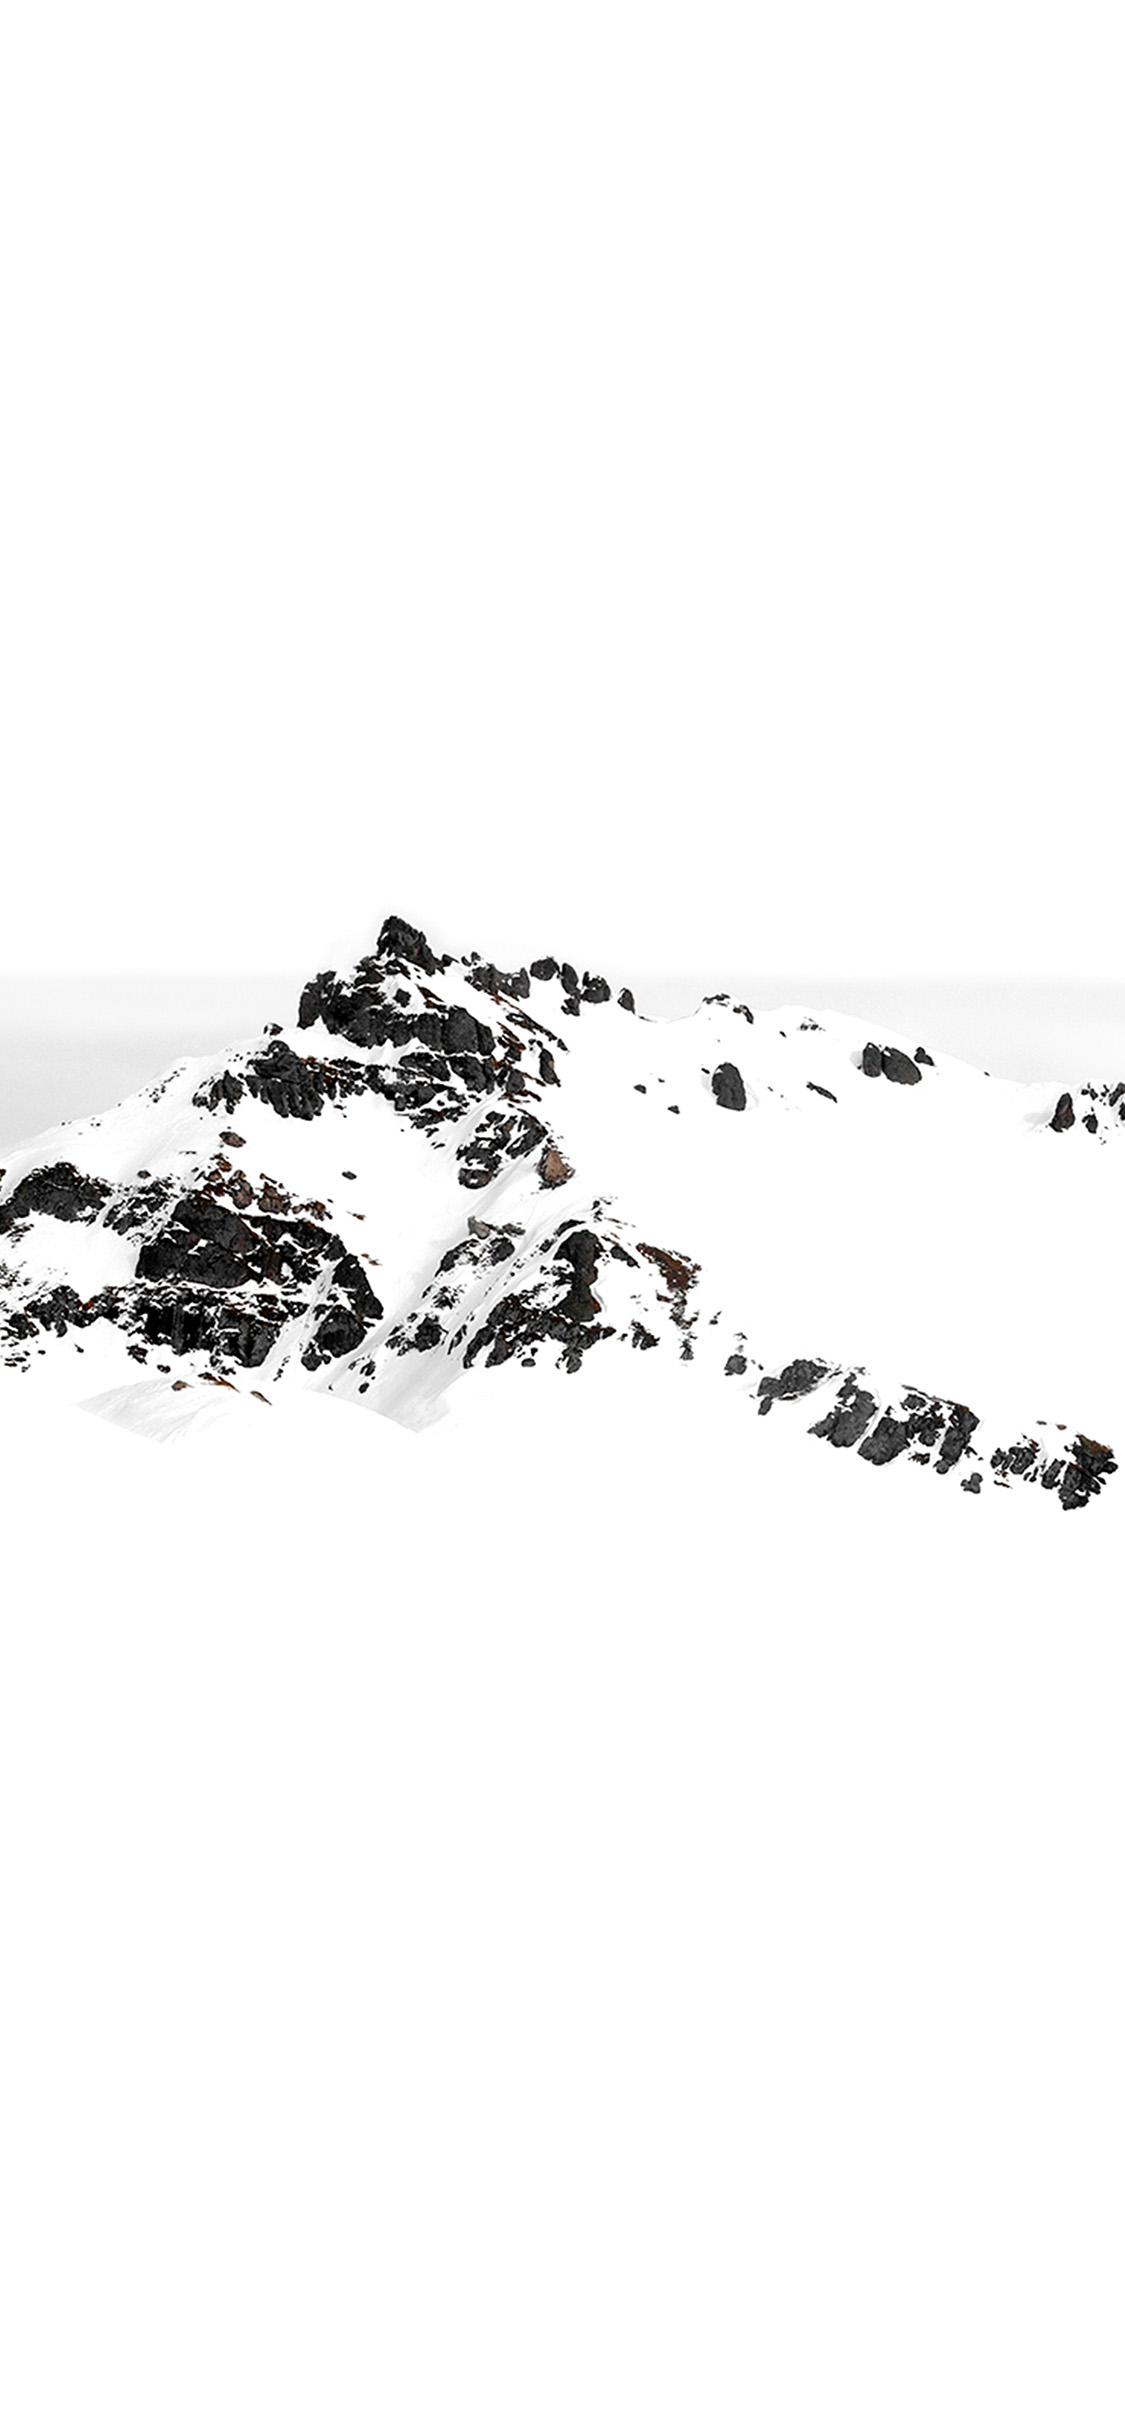 iPhonexpapers.com-Apple-iPhone-wallpaper-bj77-art-minimal-simple-mountain